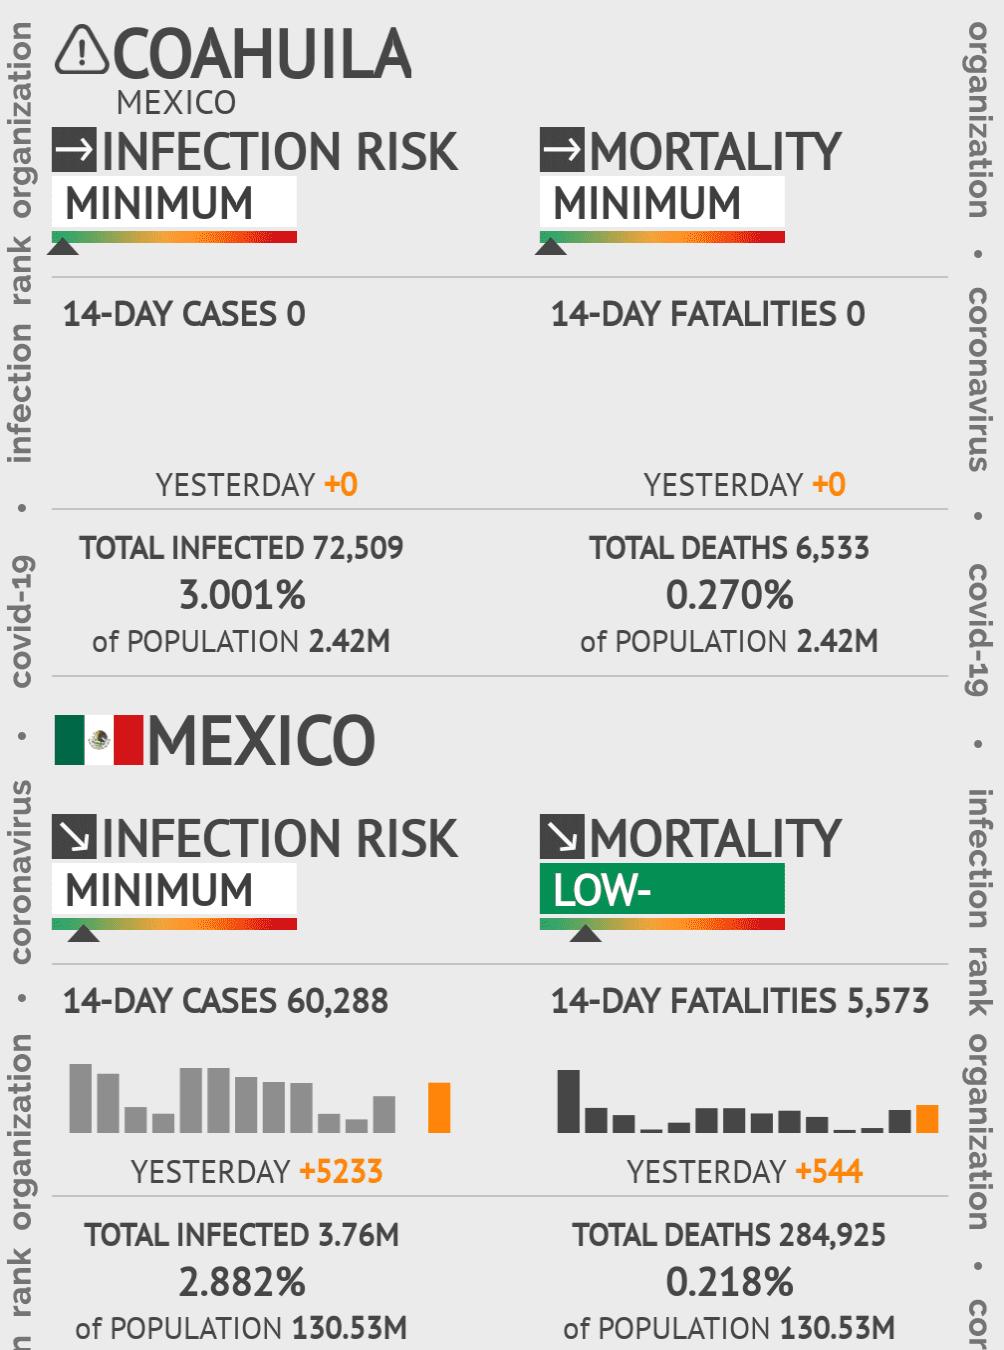 Coahuila Coronavirus Covid-19 Risk of Infection on March 03, 2021